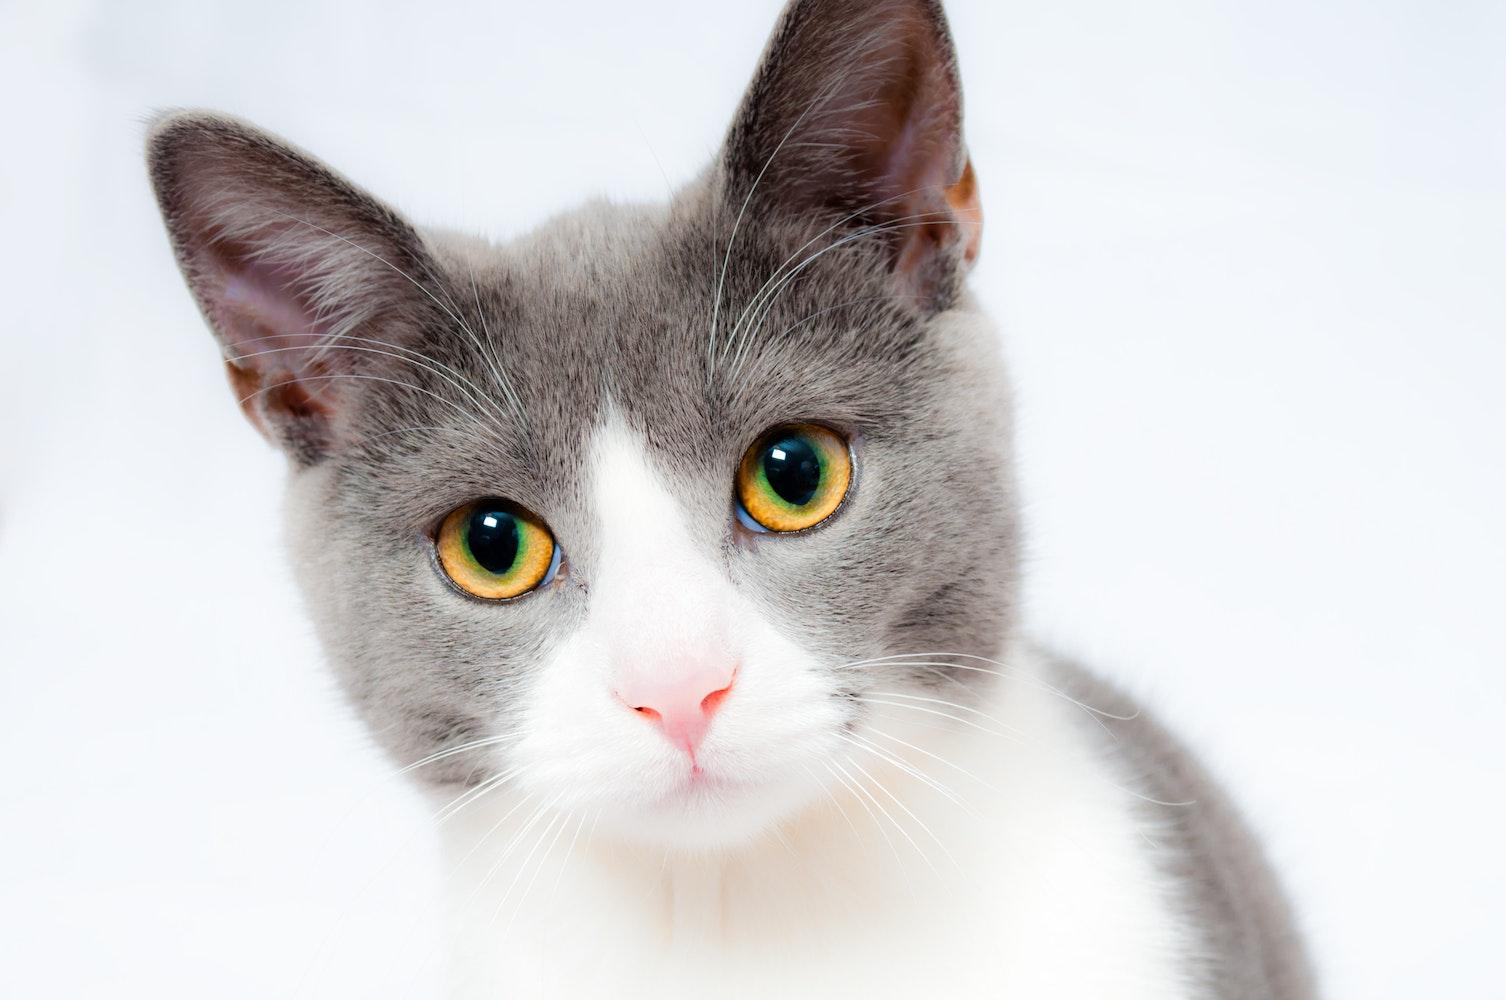 cat images pexels free stock photos